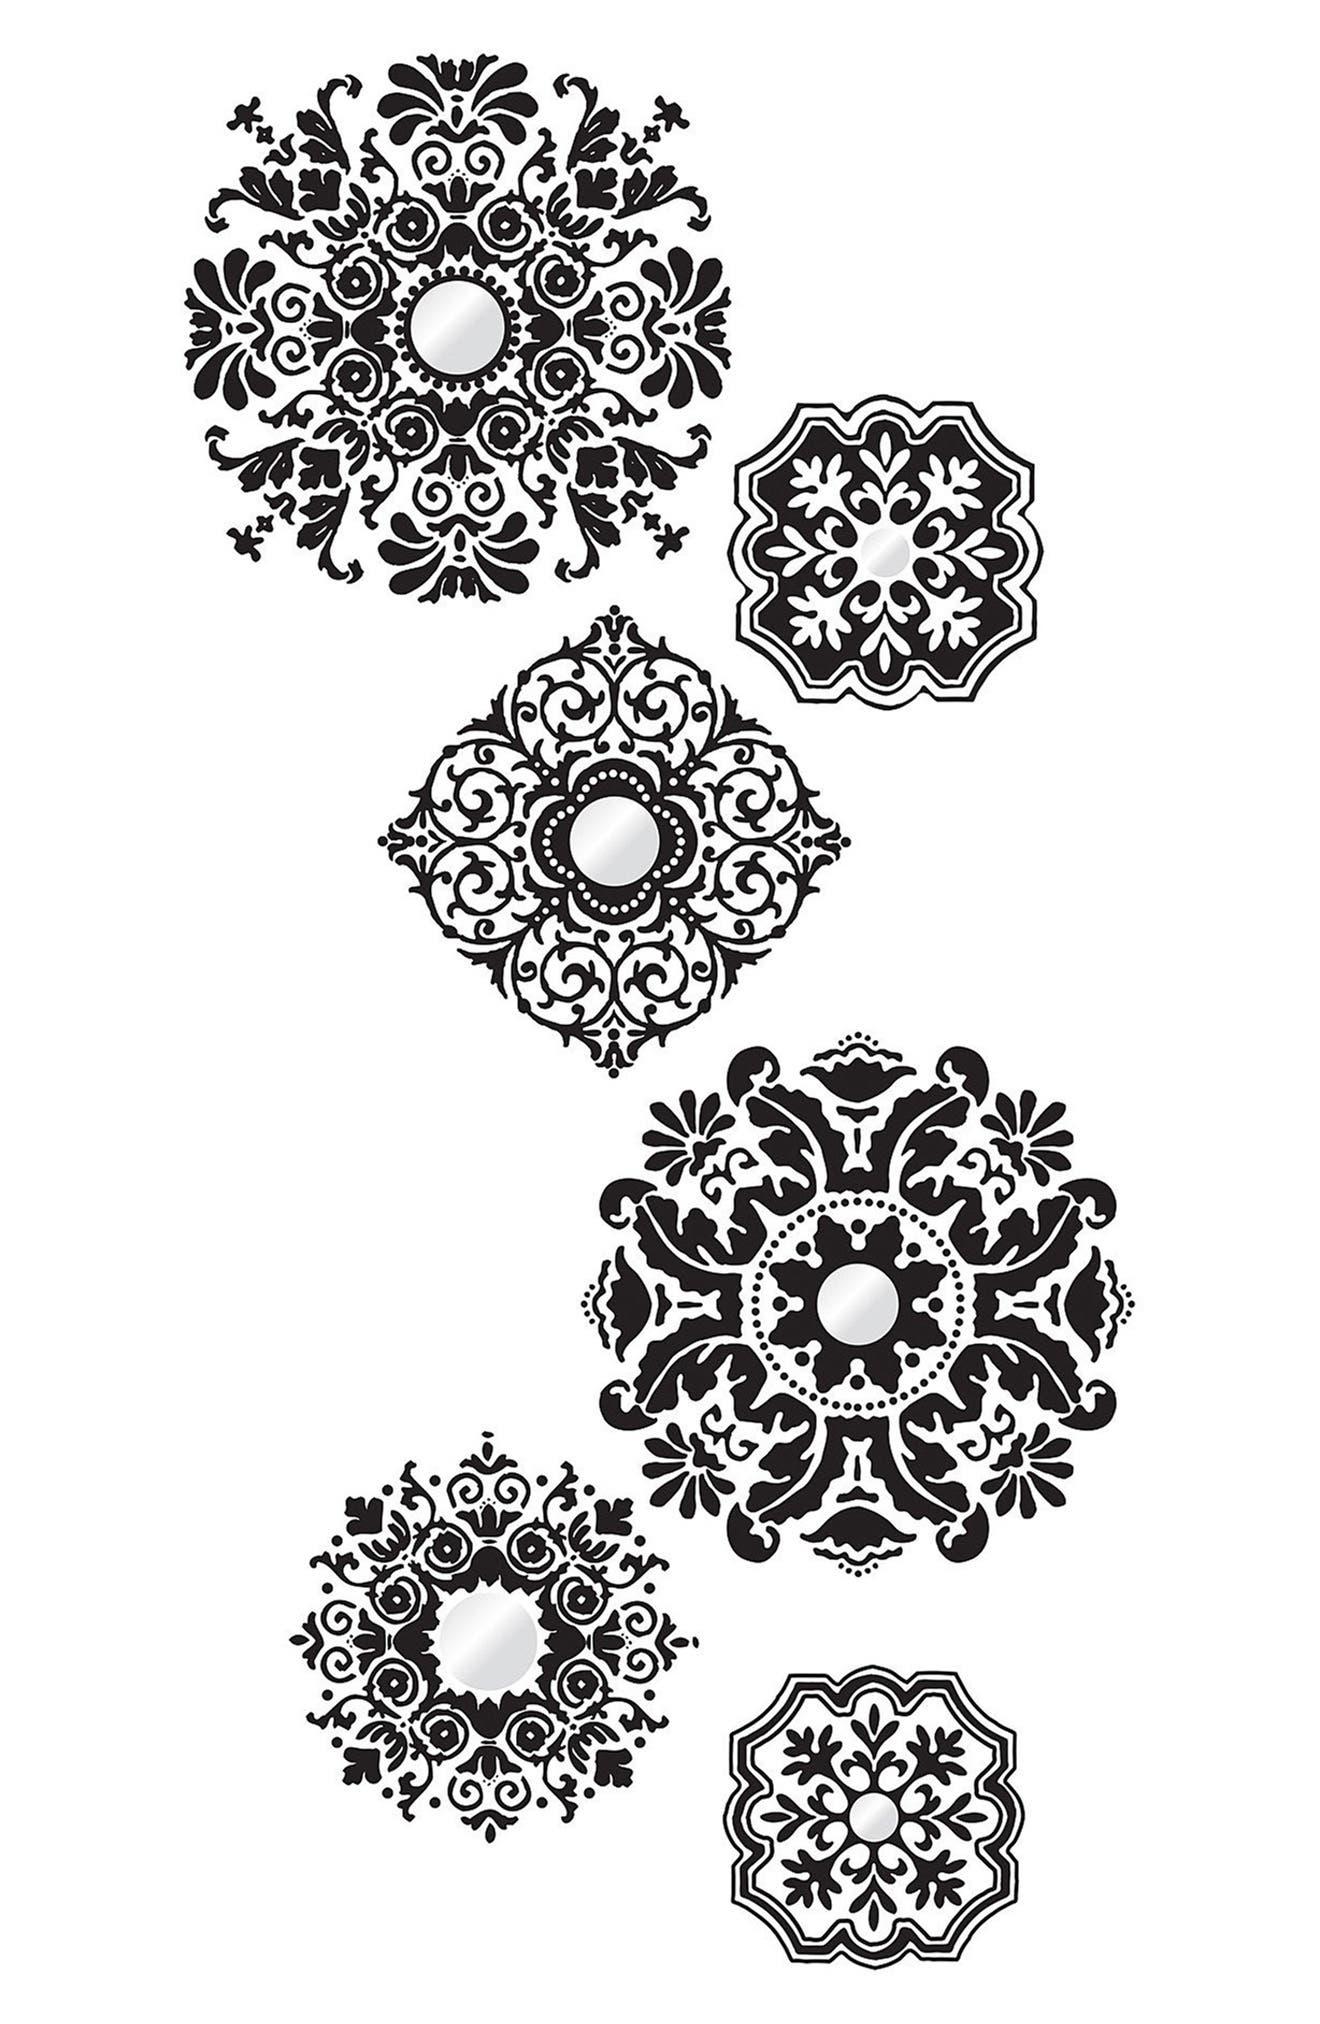 Baroque 6-Piece Wall Art Decal Set,                         Main,                         color, Black